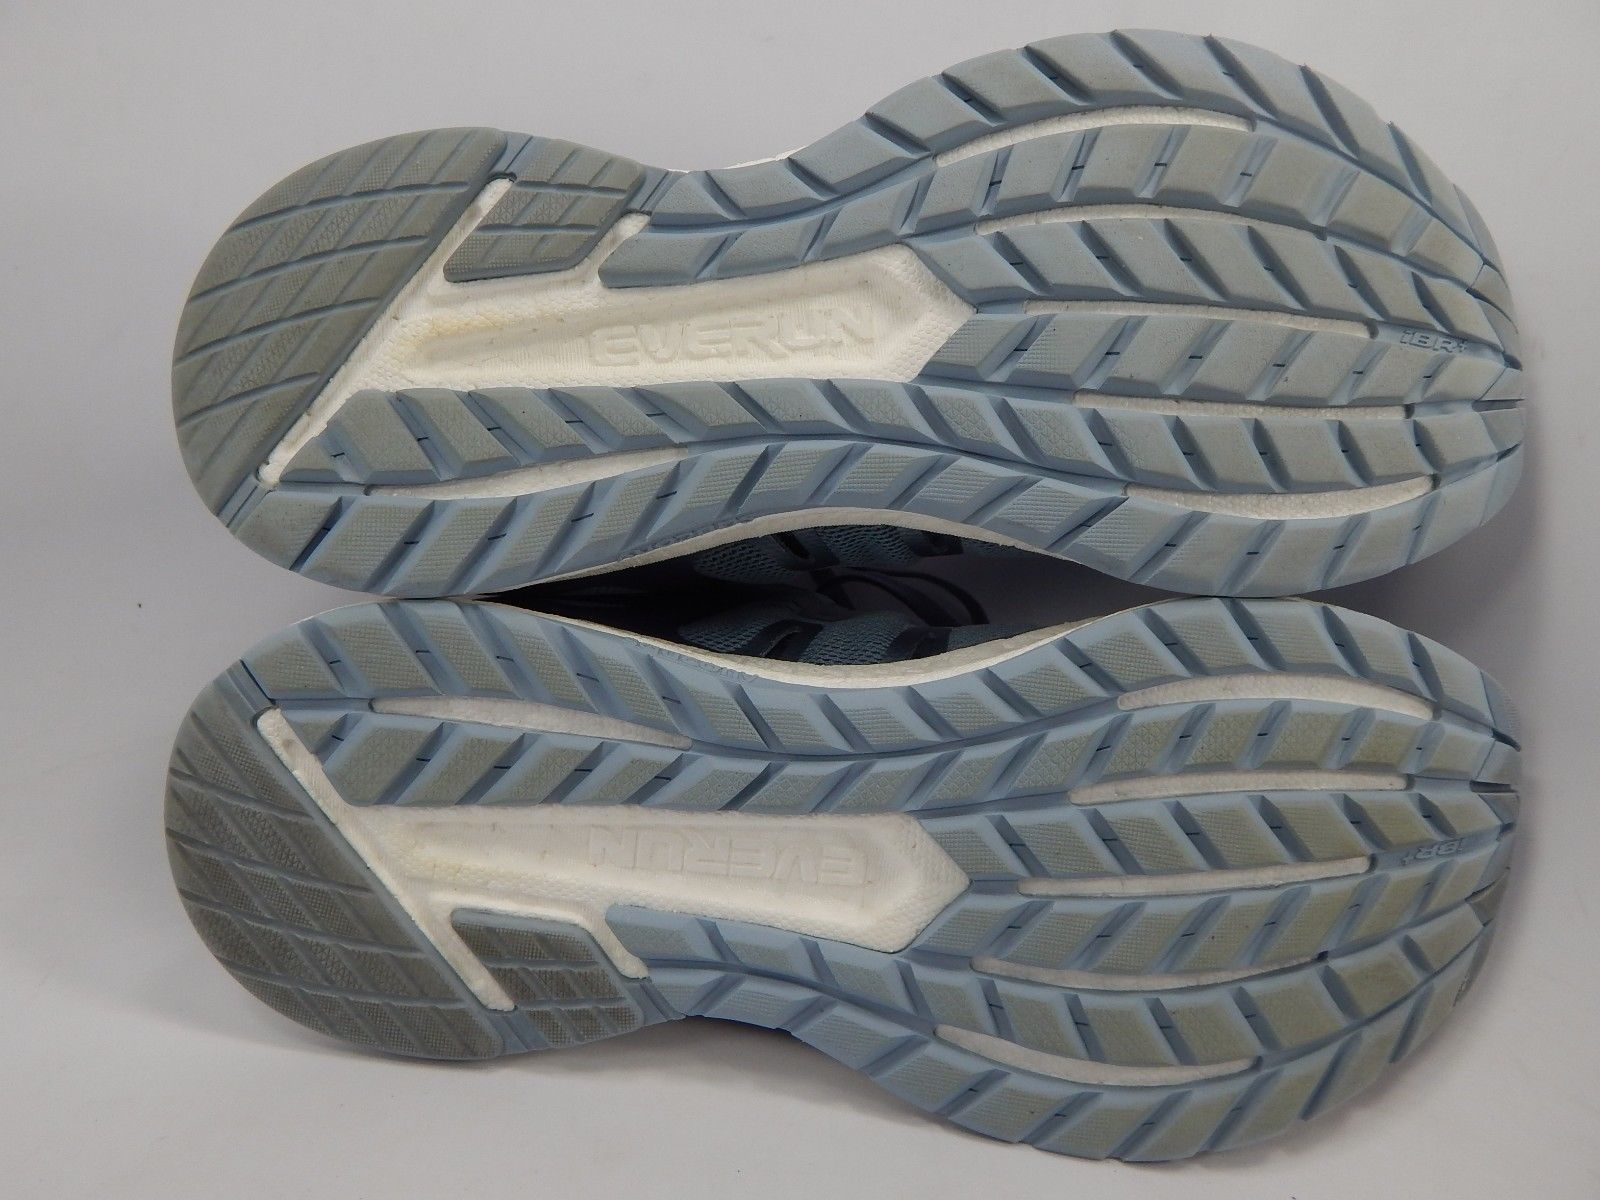 Saucony Triumph ISO 4 Size 9.5 M (B) EU 41 Women's Running Shoes Gray S10413-1